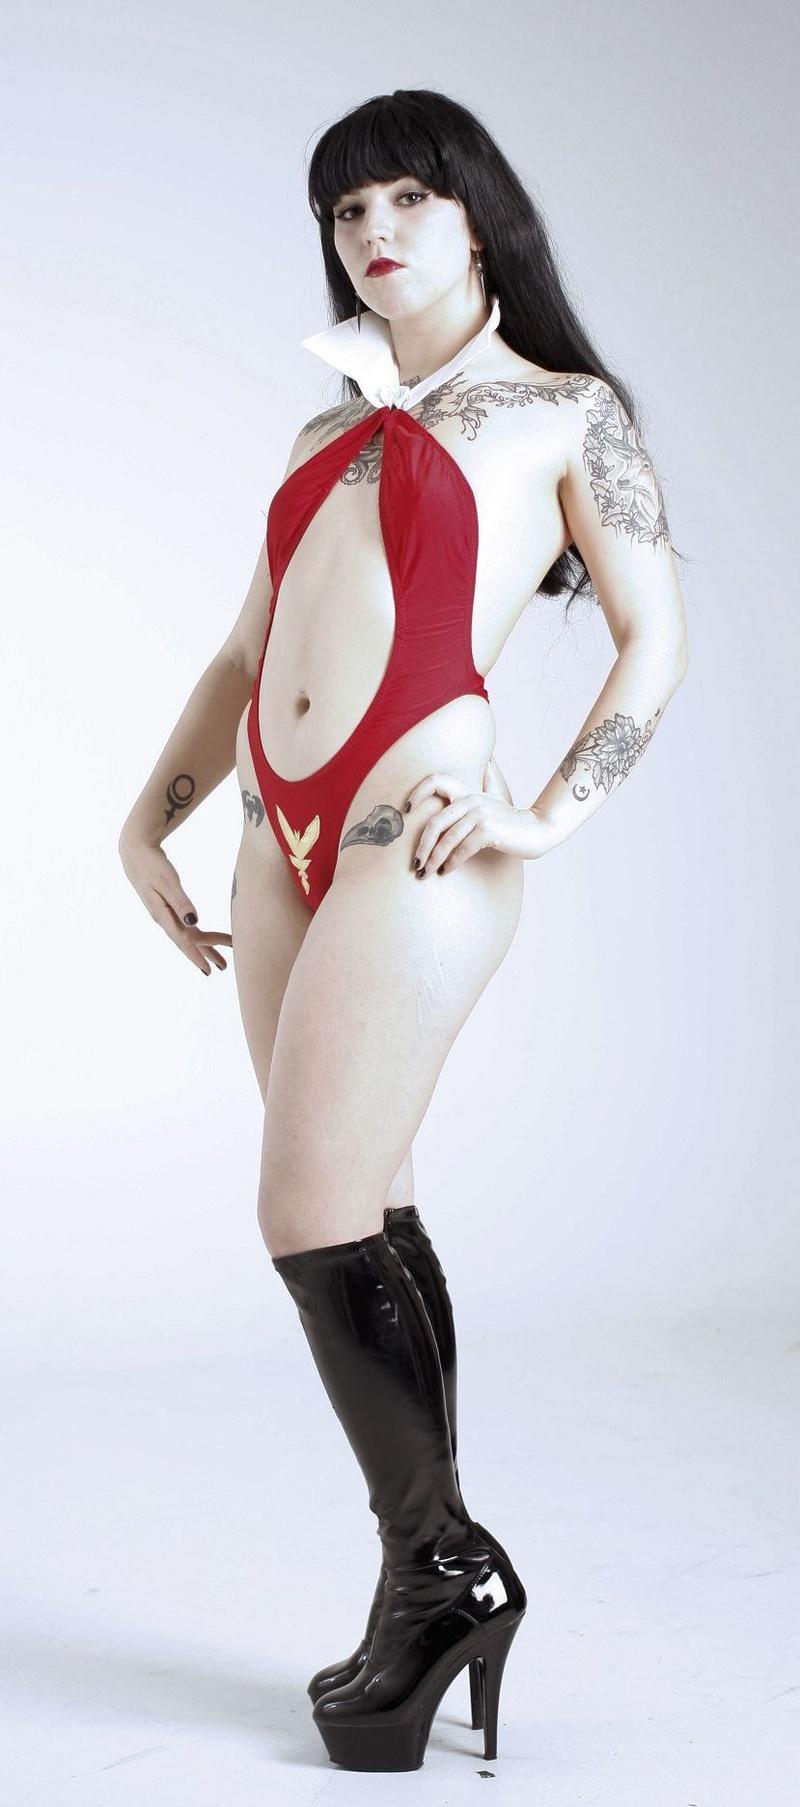 Female model photo shoot of Damiana Doe by Original Sin Photo